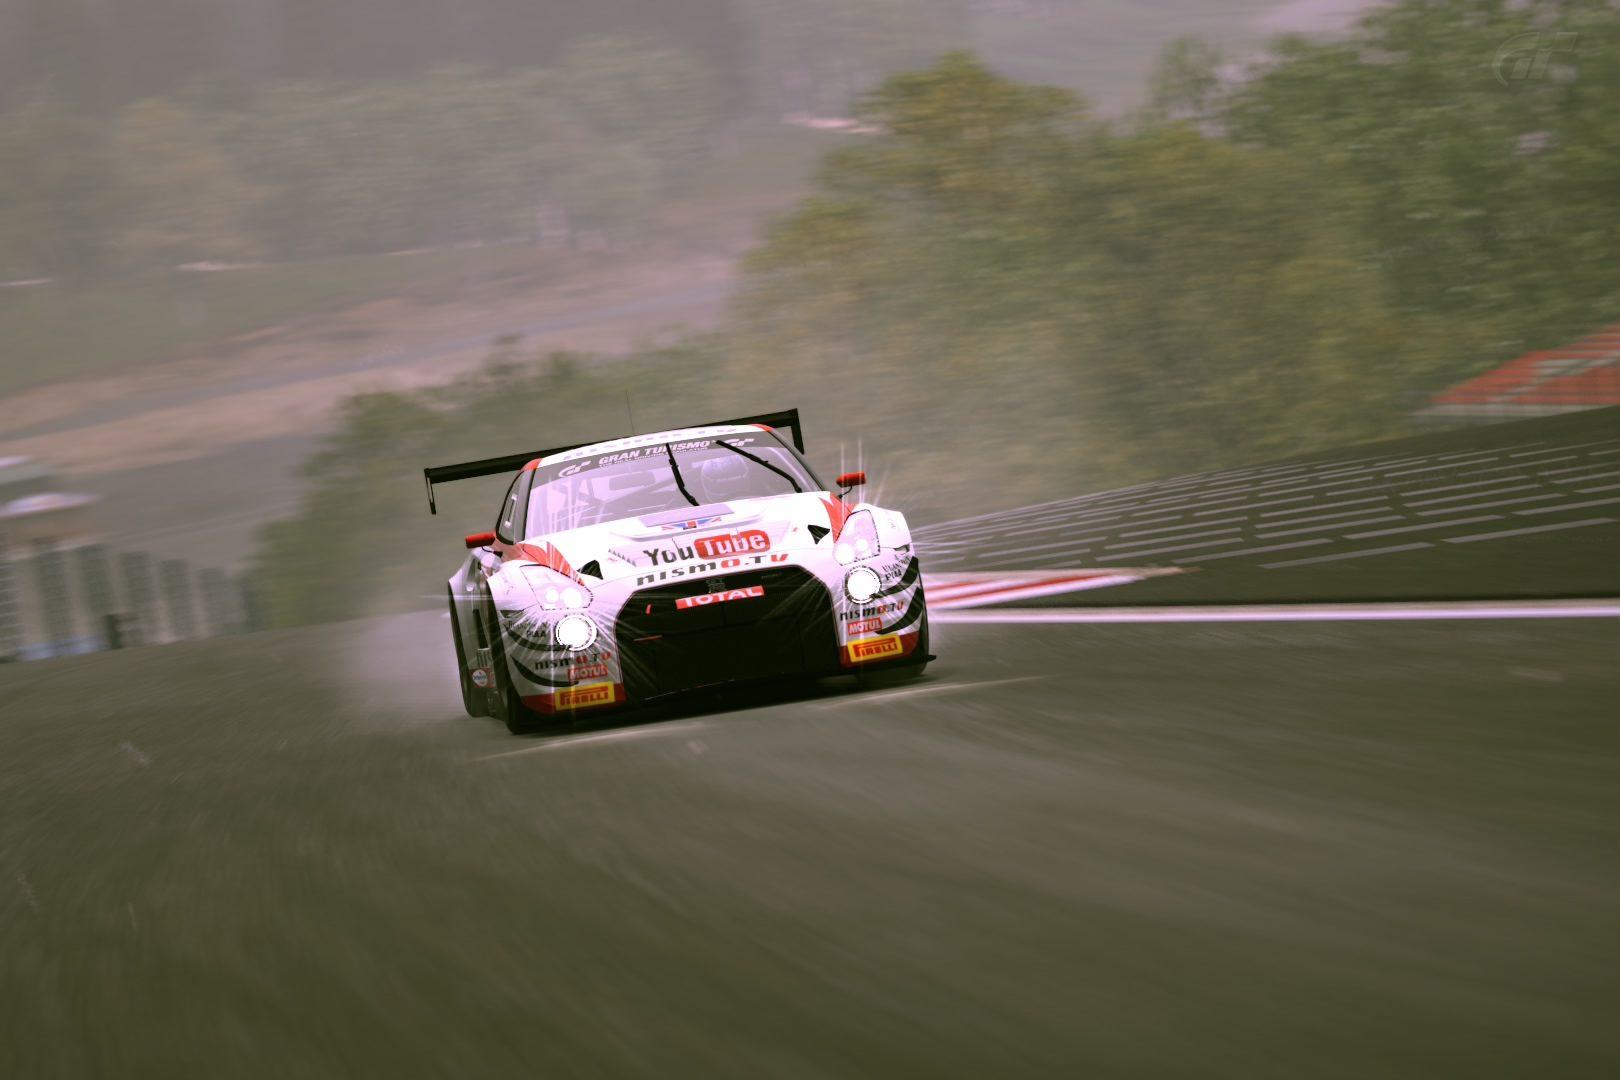 Nissan GT-R Nismo GT3 Team RJN '13 (Car).jpg